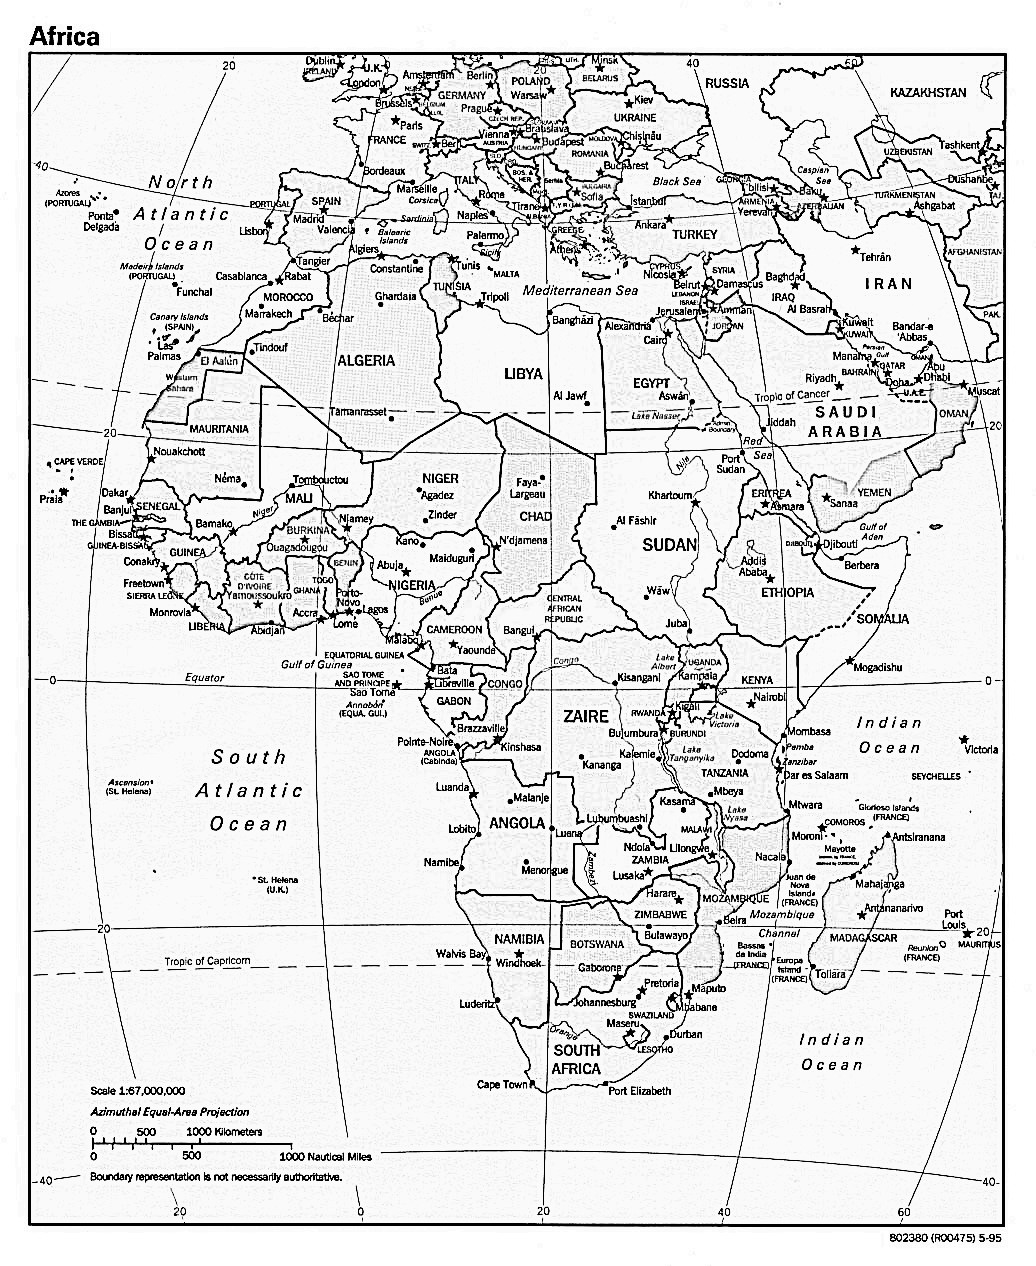 Gambar Peta Dunia Hitam Putih Doylc Asia